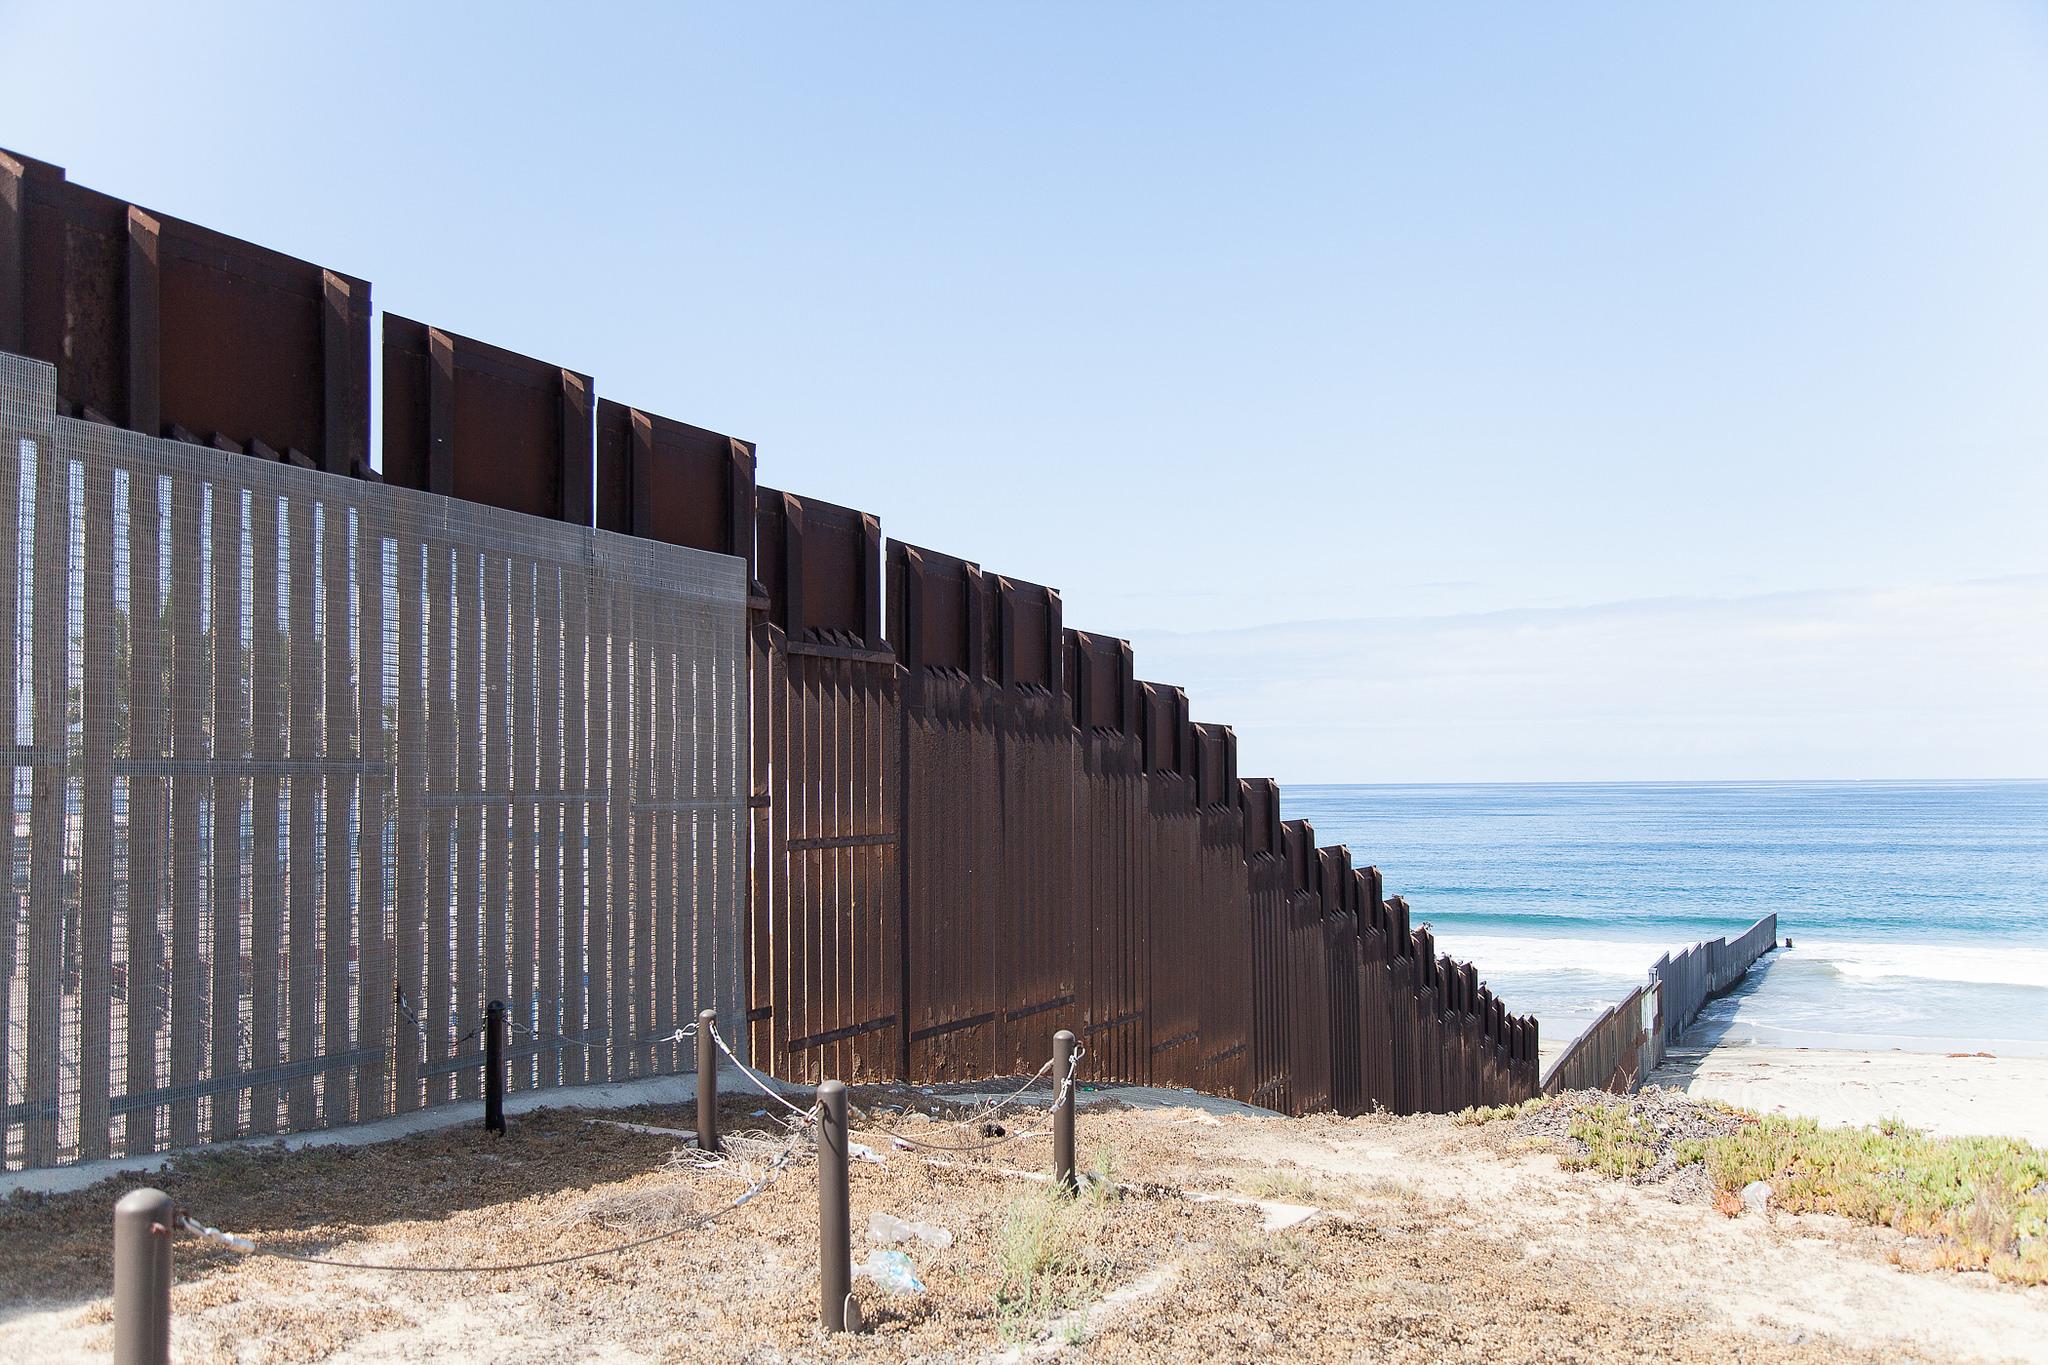 In Friendship Park, the border fence continues far into the ocean. Photo: Natalia Robert/TEDxMonumento258